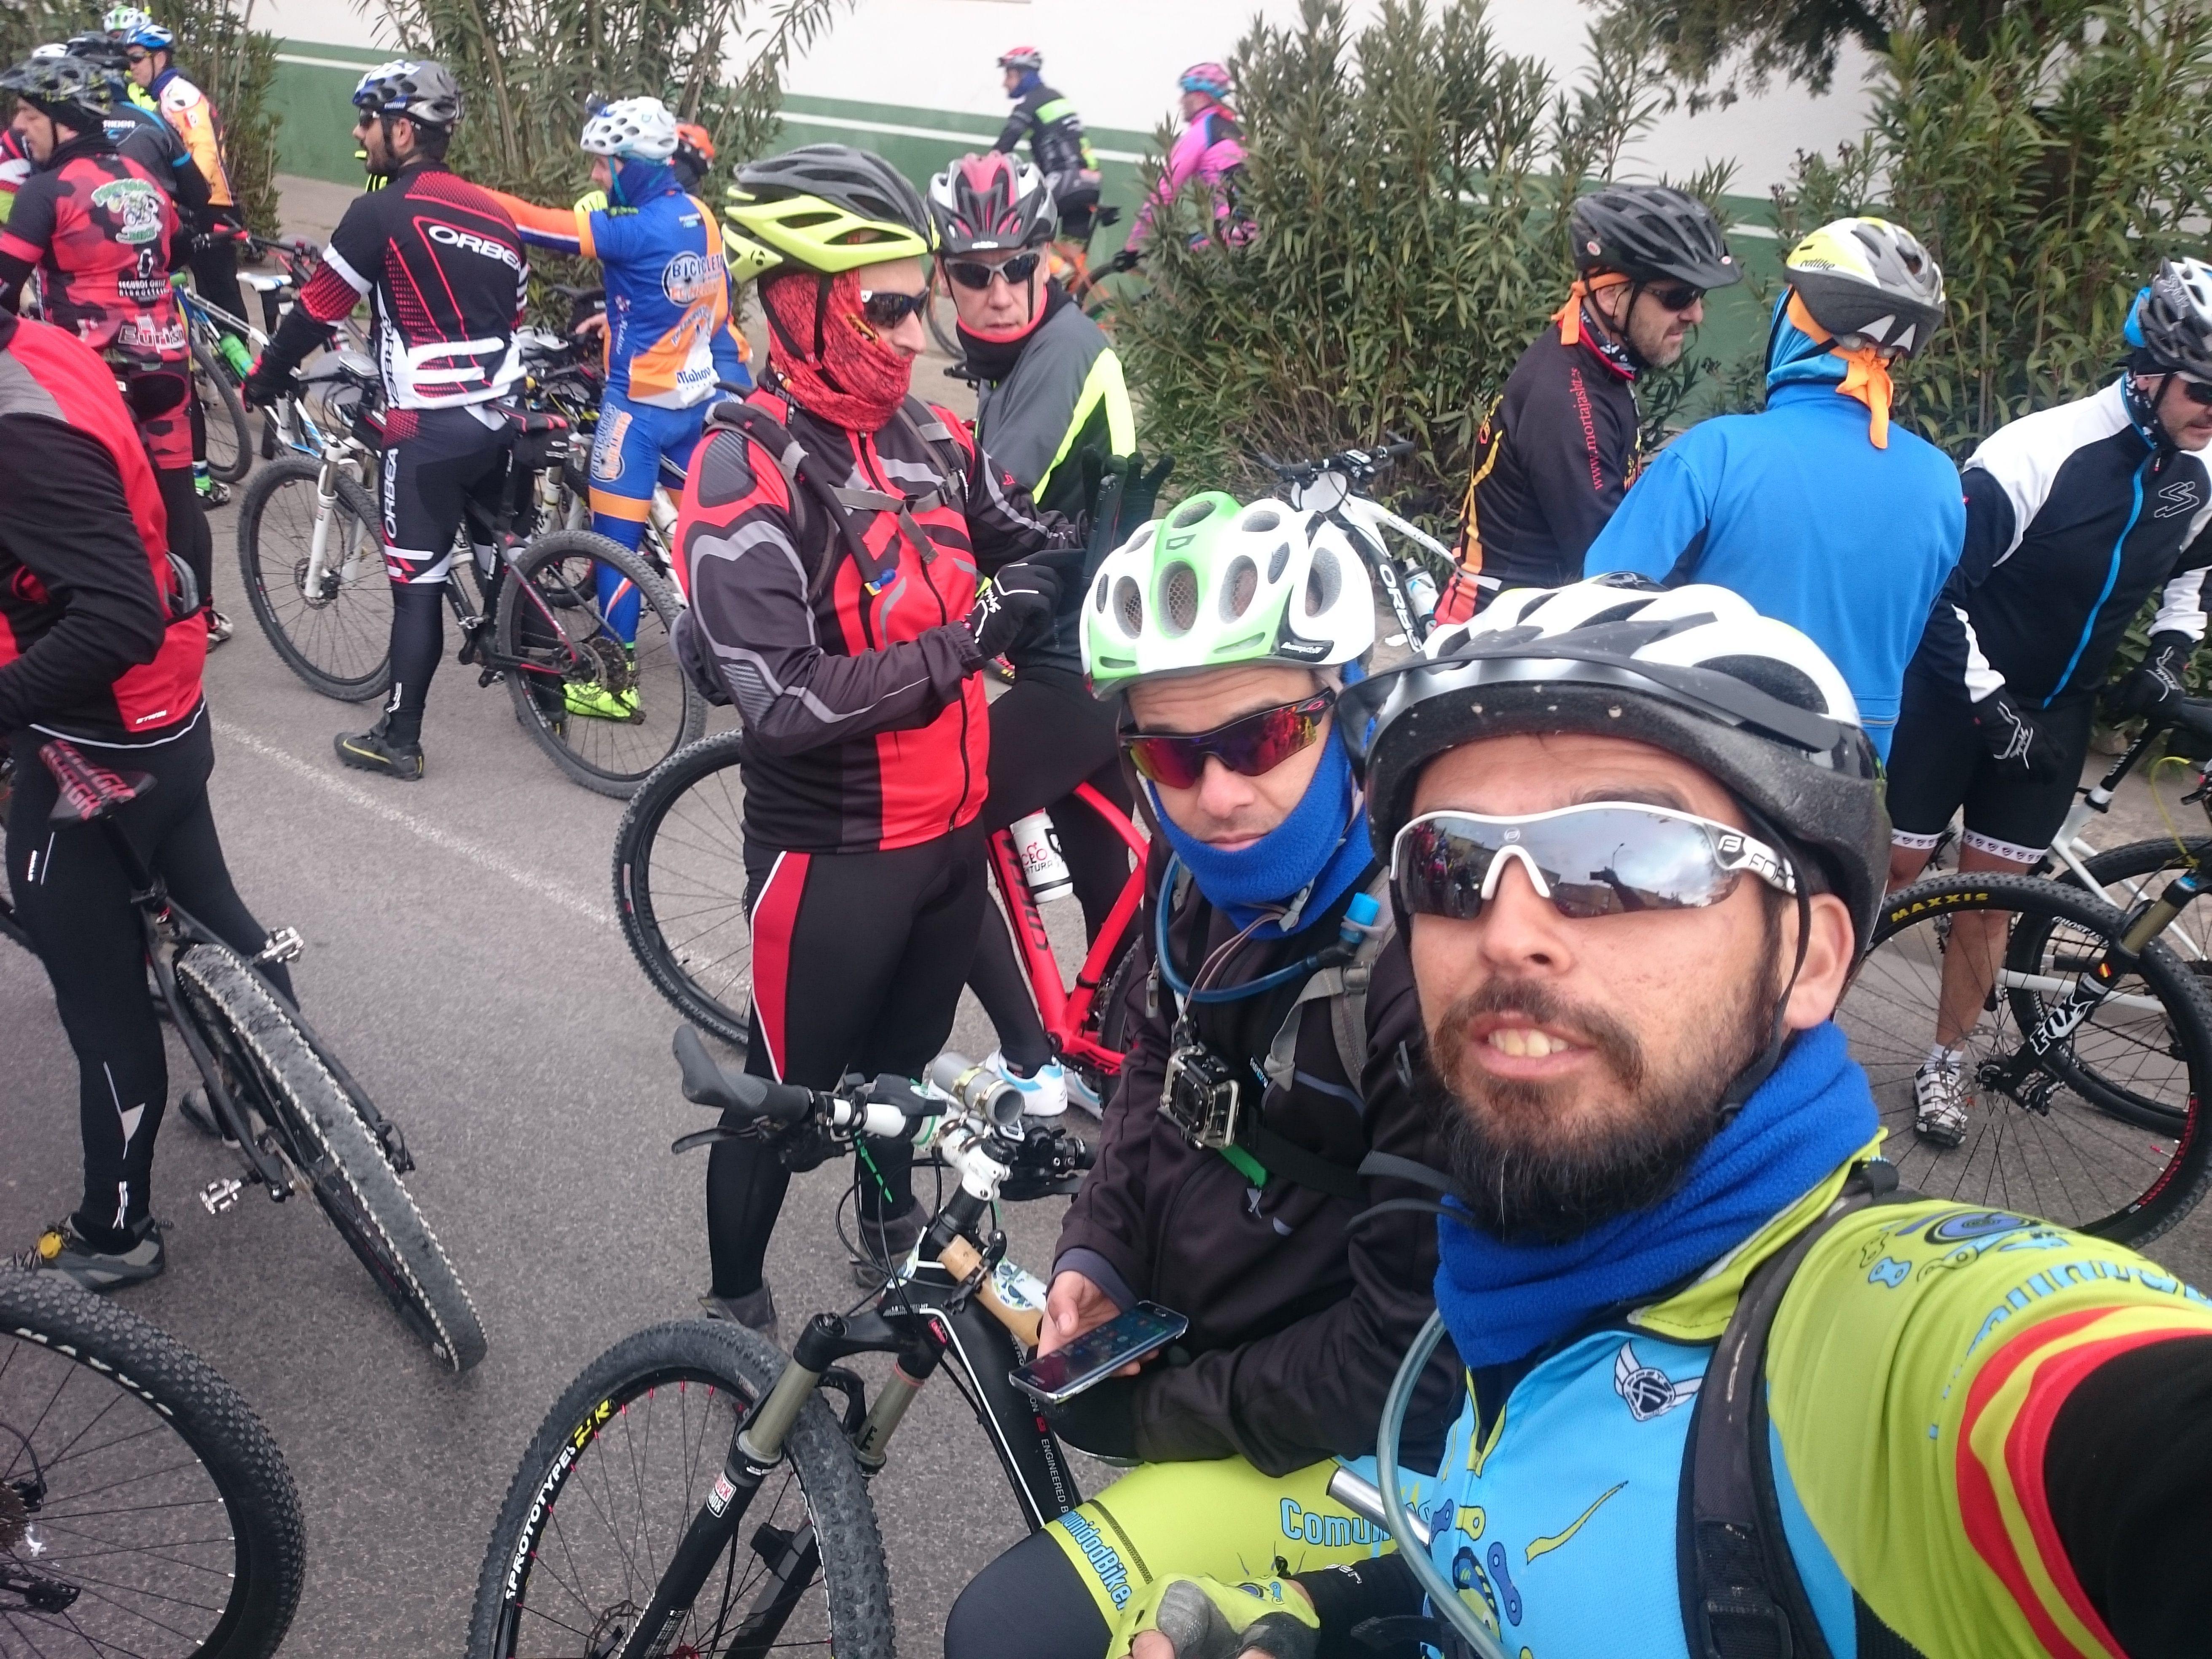 Crónica de la VIII marcha BTT de La Roda del X Circuito Albacete por Paquito206